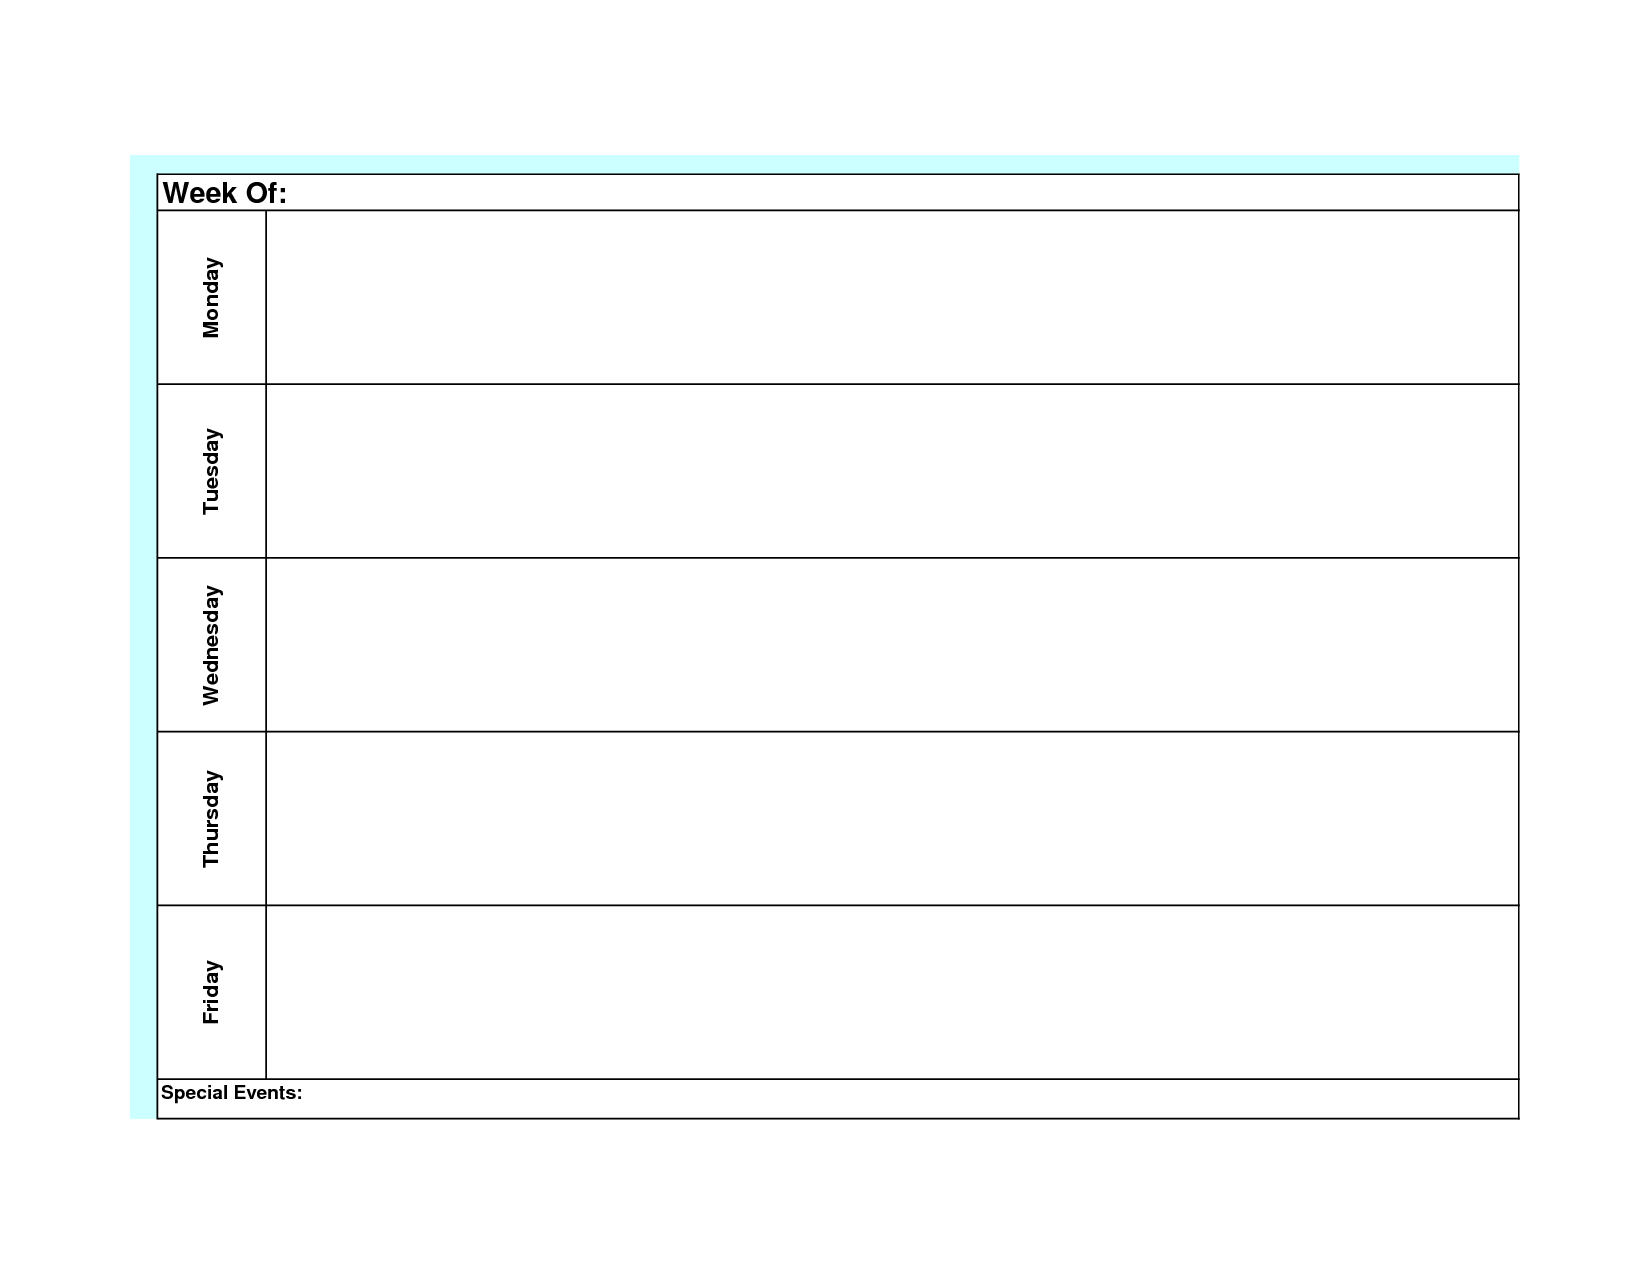 Blank Weekly Calendar Monday Through Friday Template Planner To | Smorad with regard to Blank Printable Calendar M-F